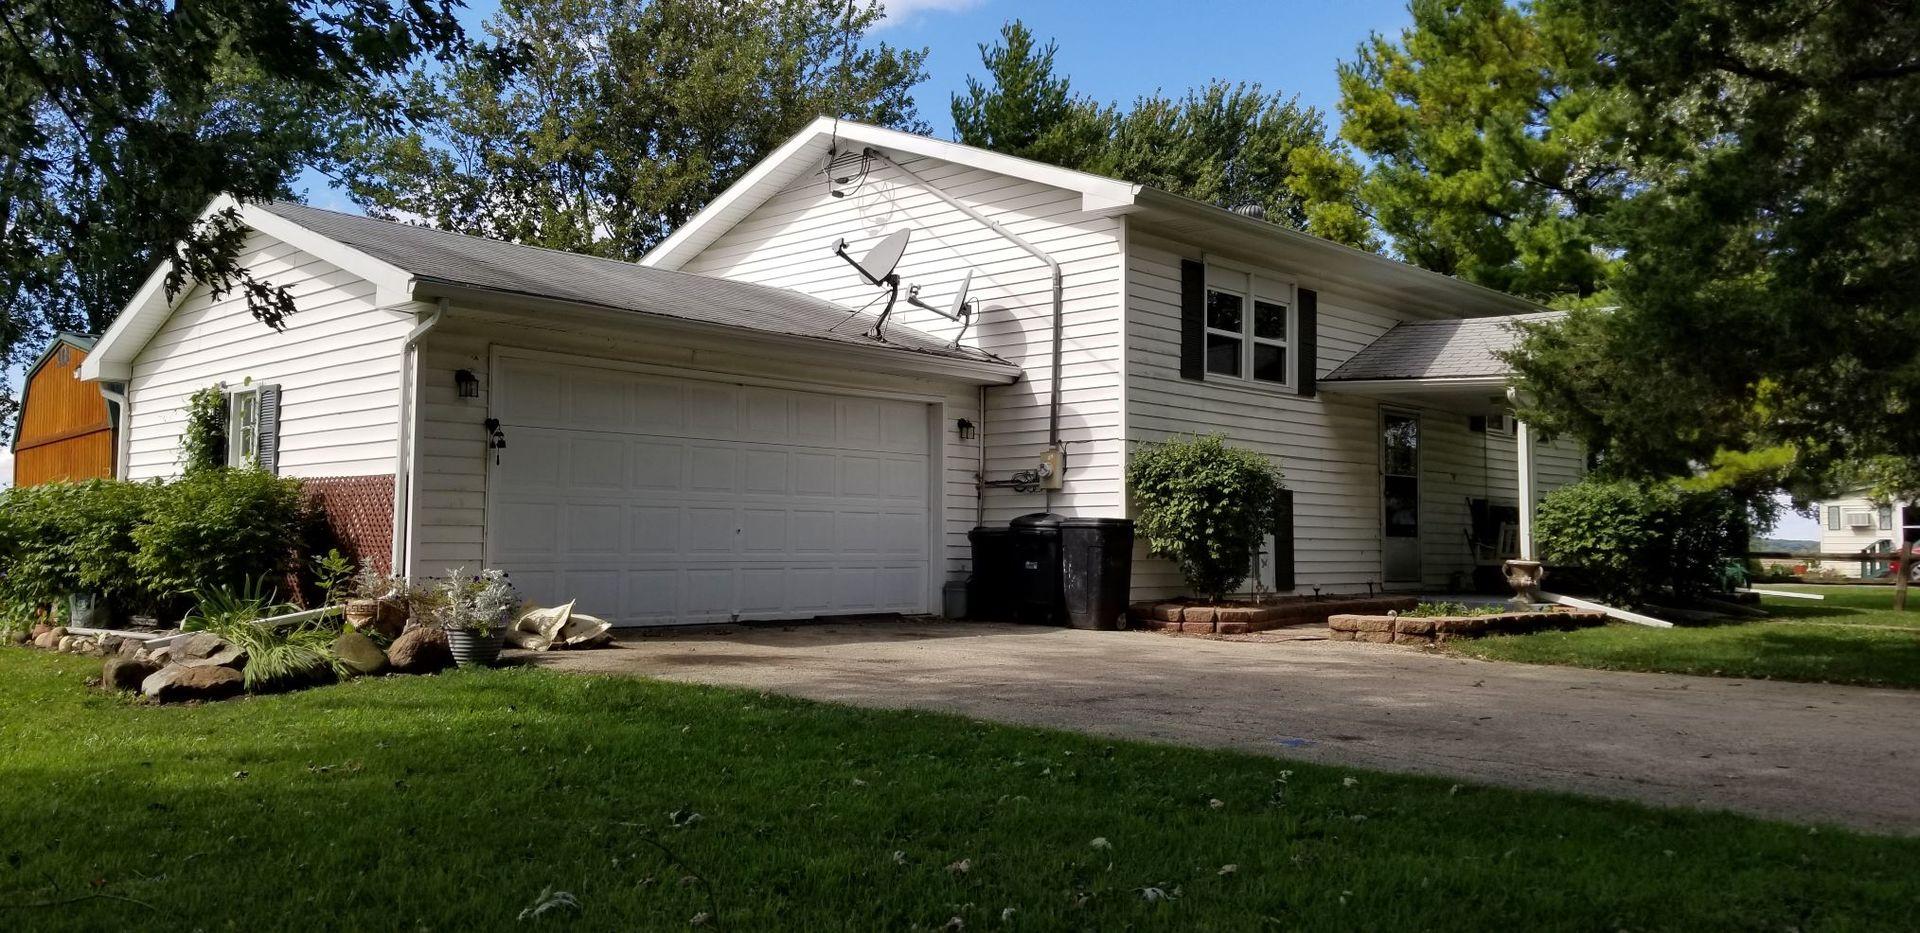 106 West, Chana, Illinois, 61015